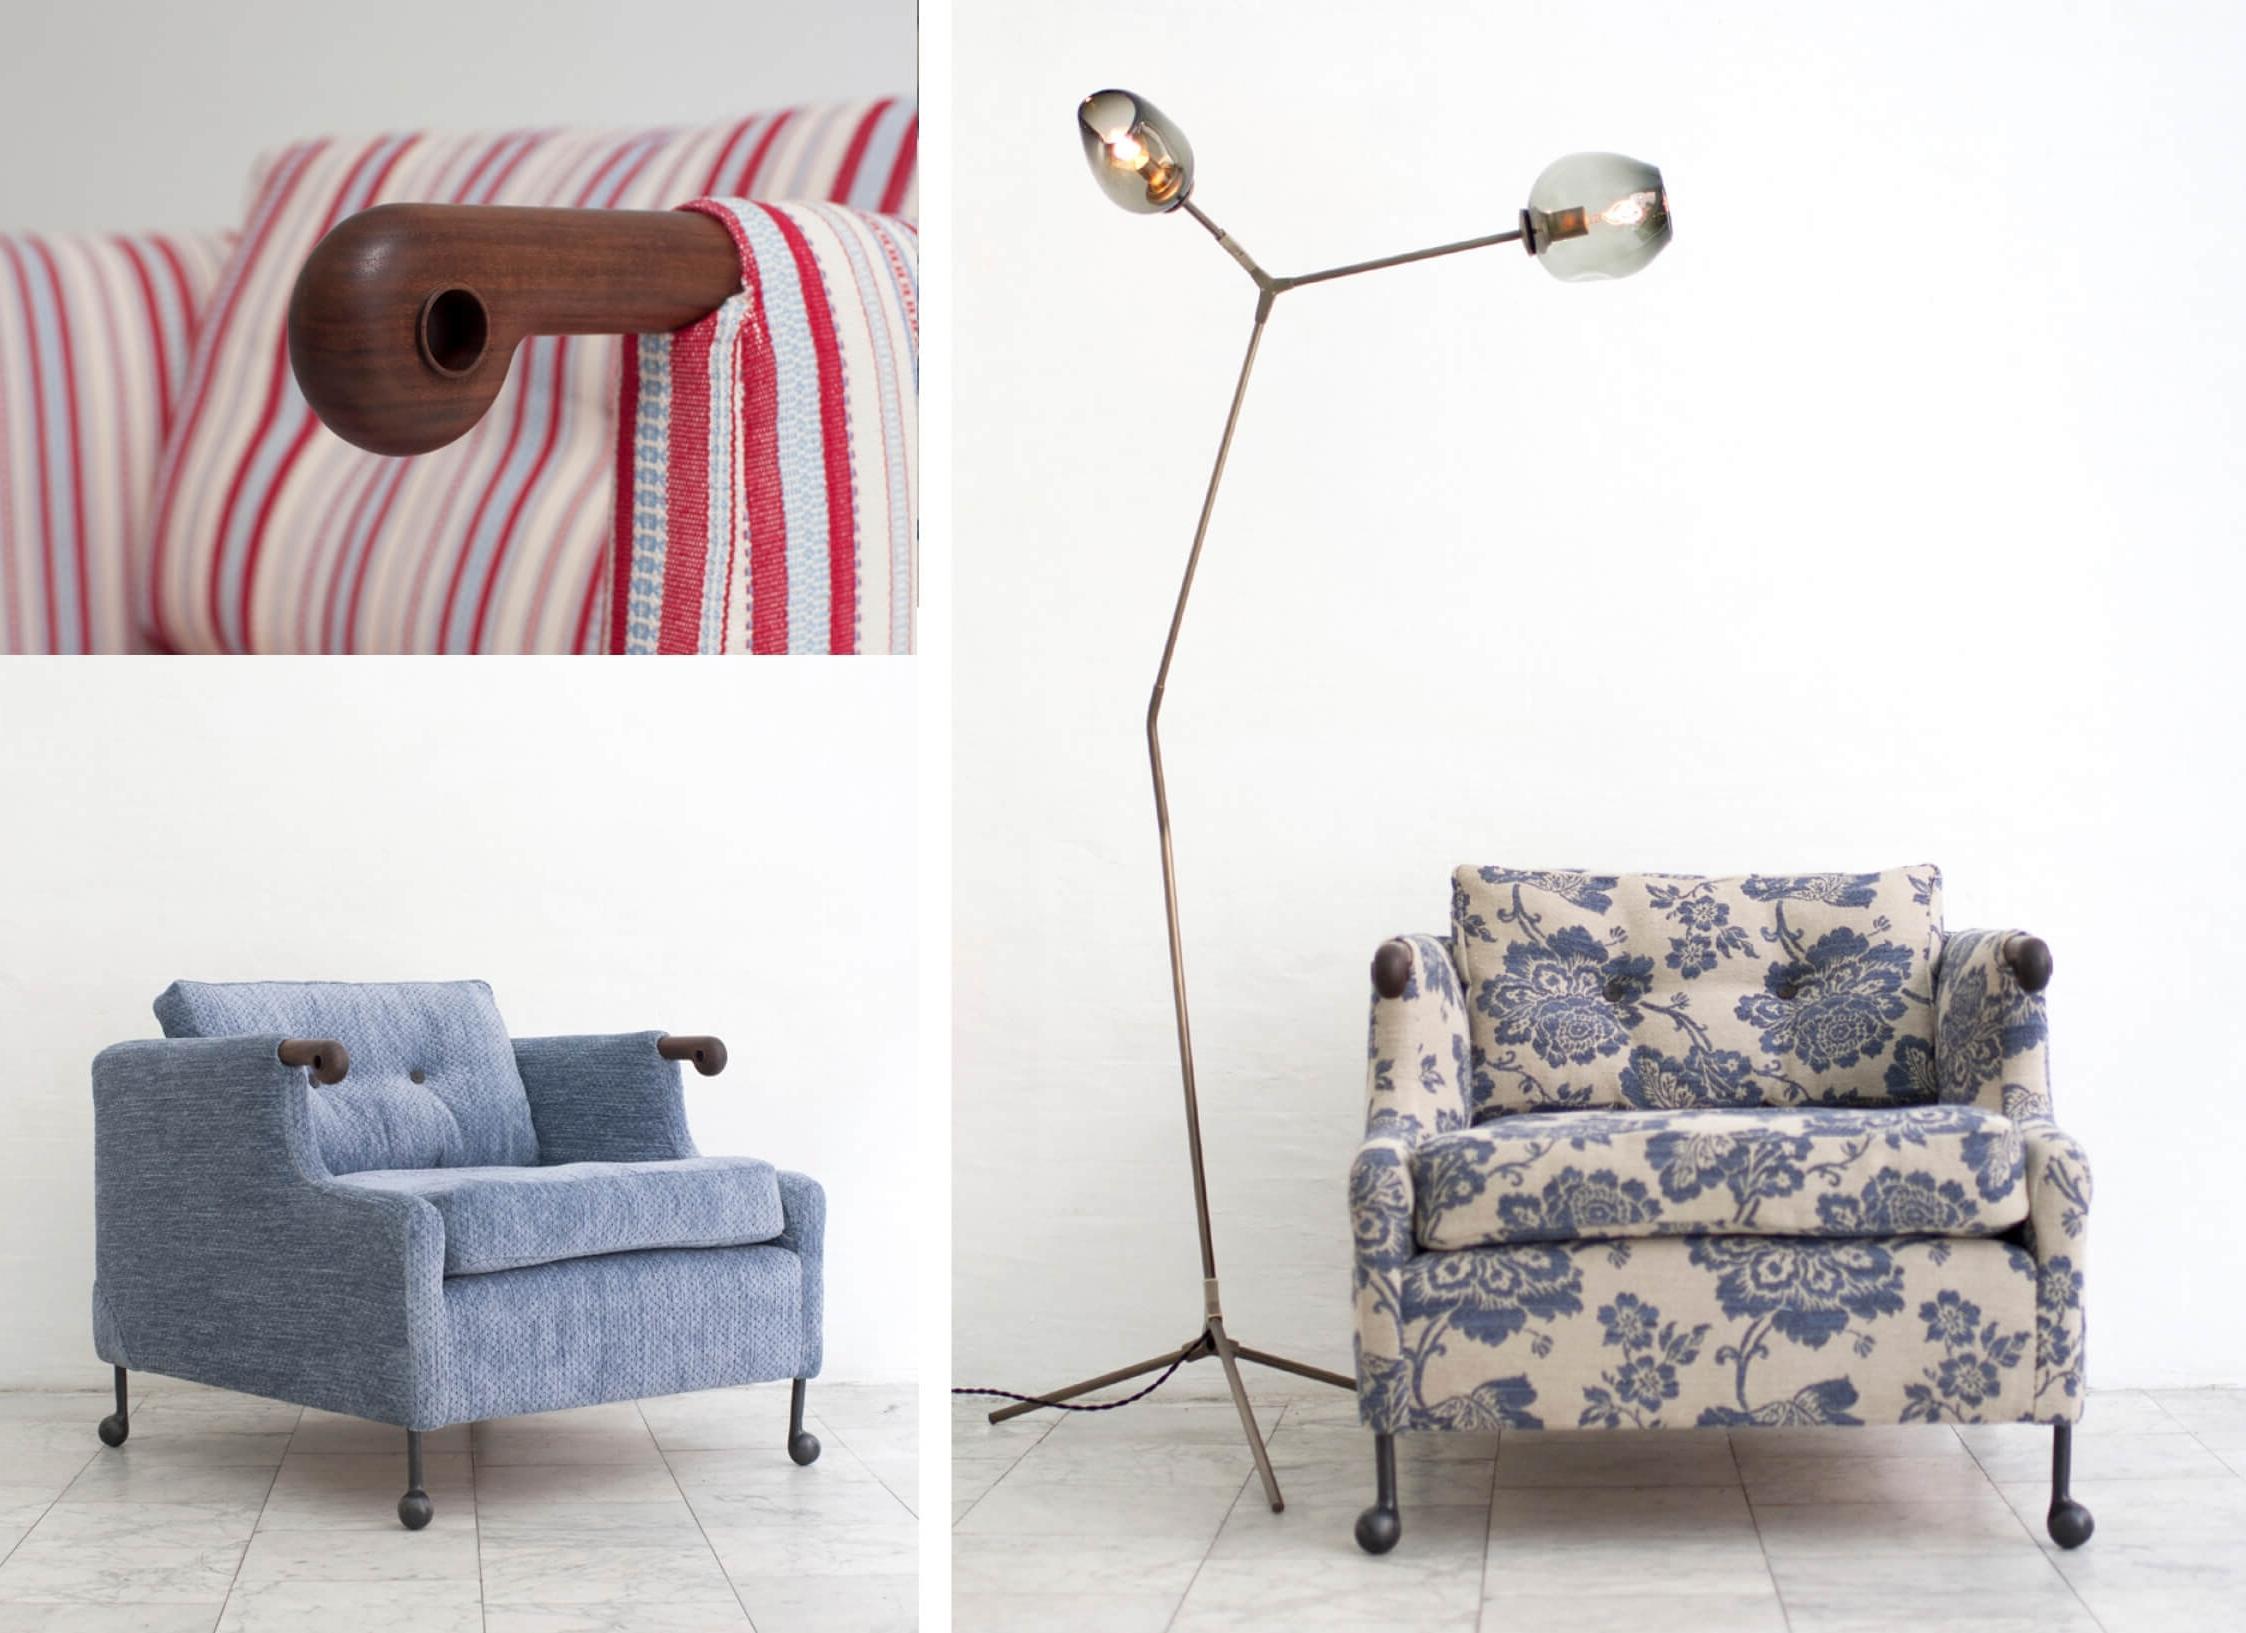 2018 Kijiji Kitchener Sectional Sofas Pertaining To Furniture : Kijiji Sofa Table Kitchener Roy Button Tufted (View 10 of 15)